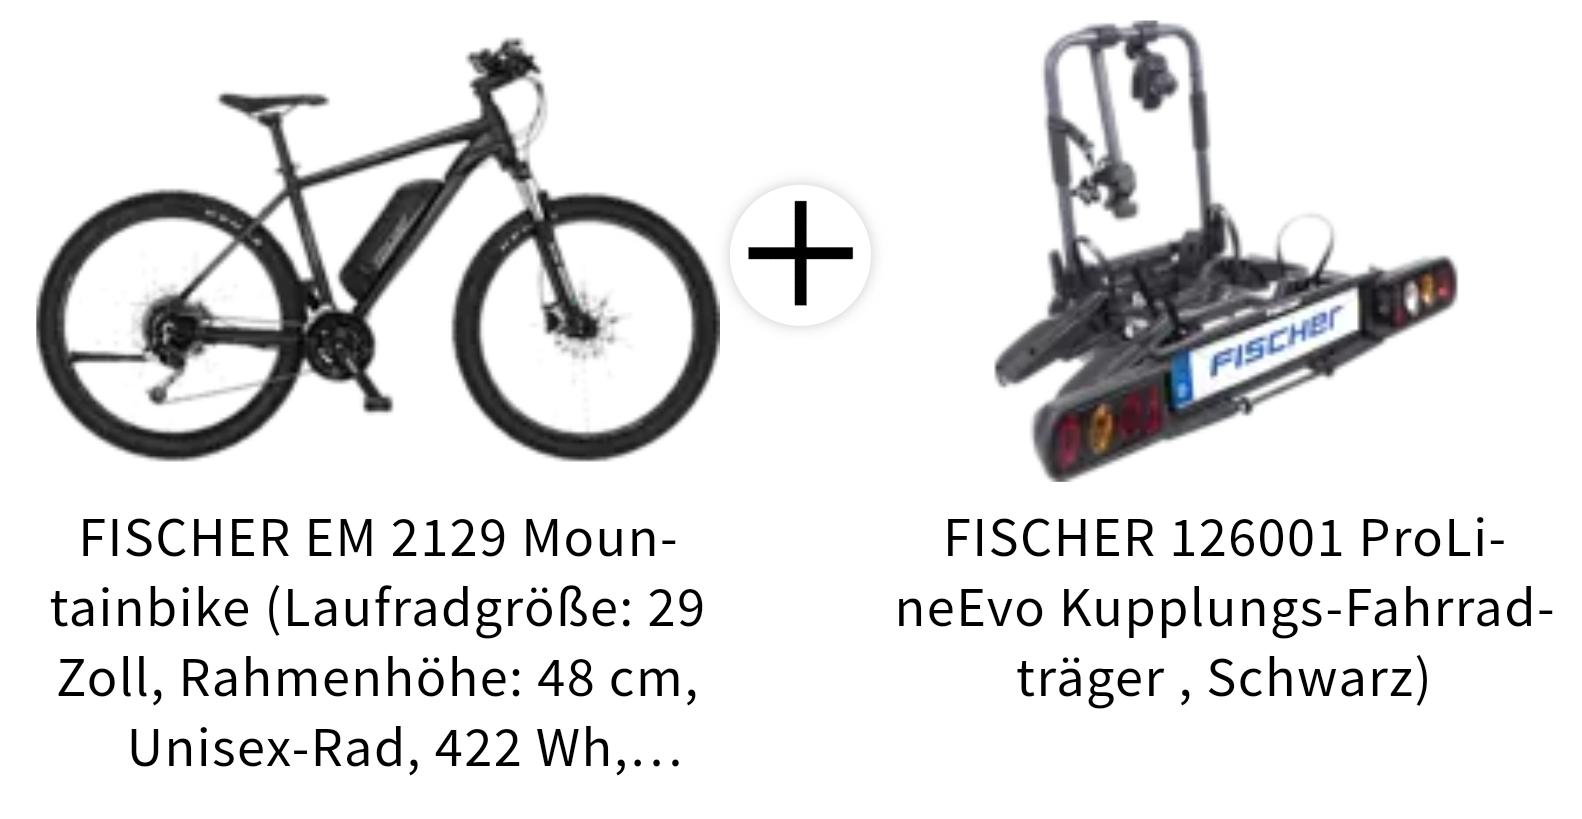 FISCHER EM 2129 Mountainbike inklusive Fischer Kupplungs-Fahrradträger ProLineEvo